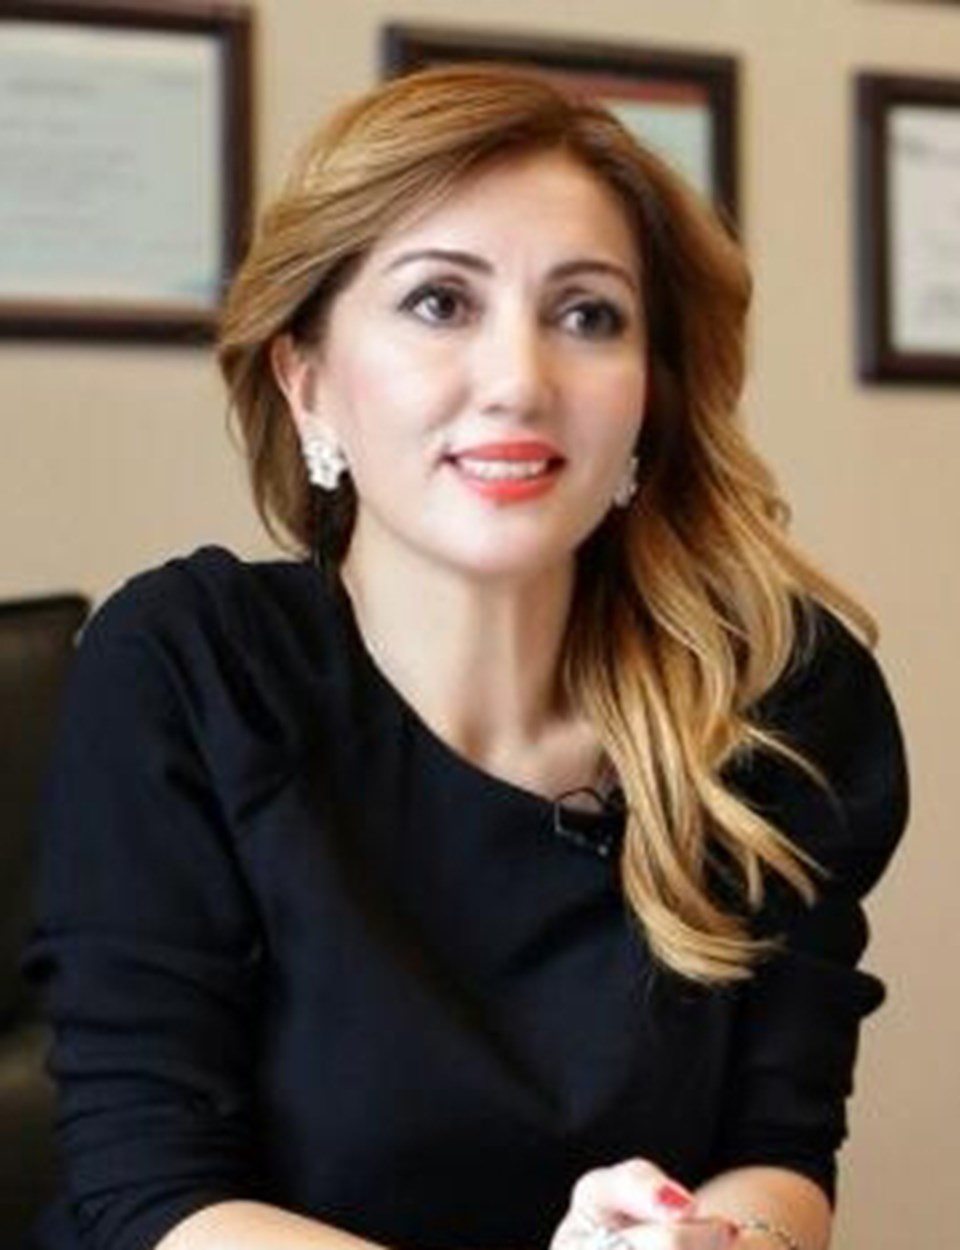 Jinekolog ve Cinsel Terapist Op. Dr. Yeşim Yerçok